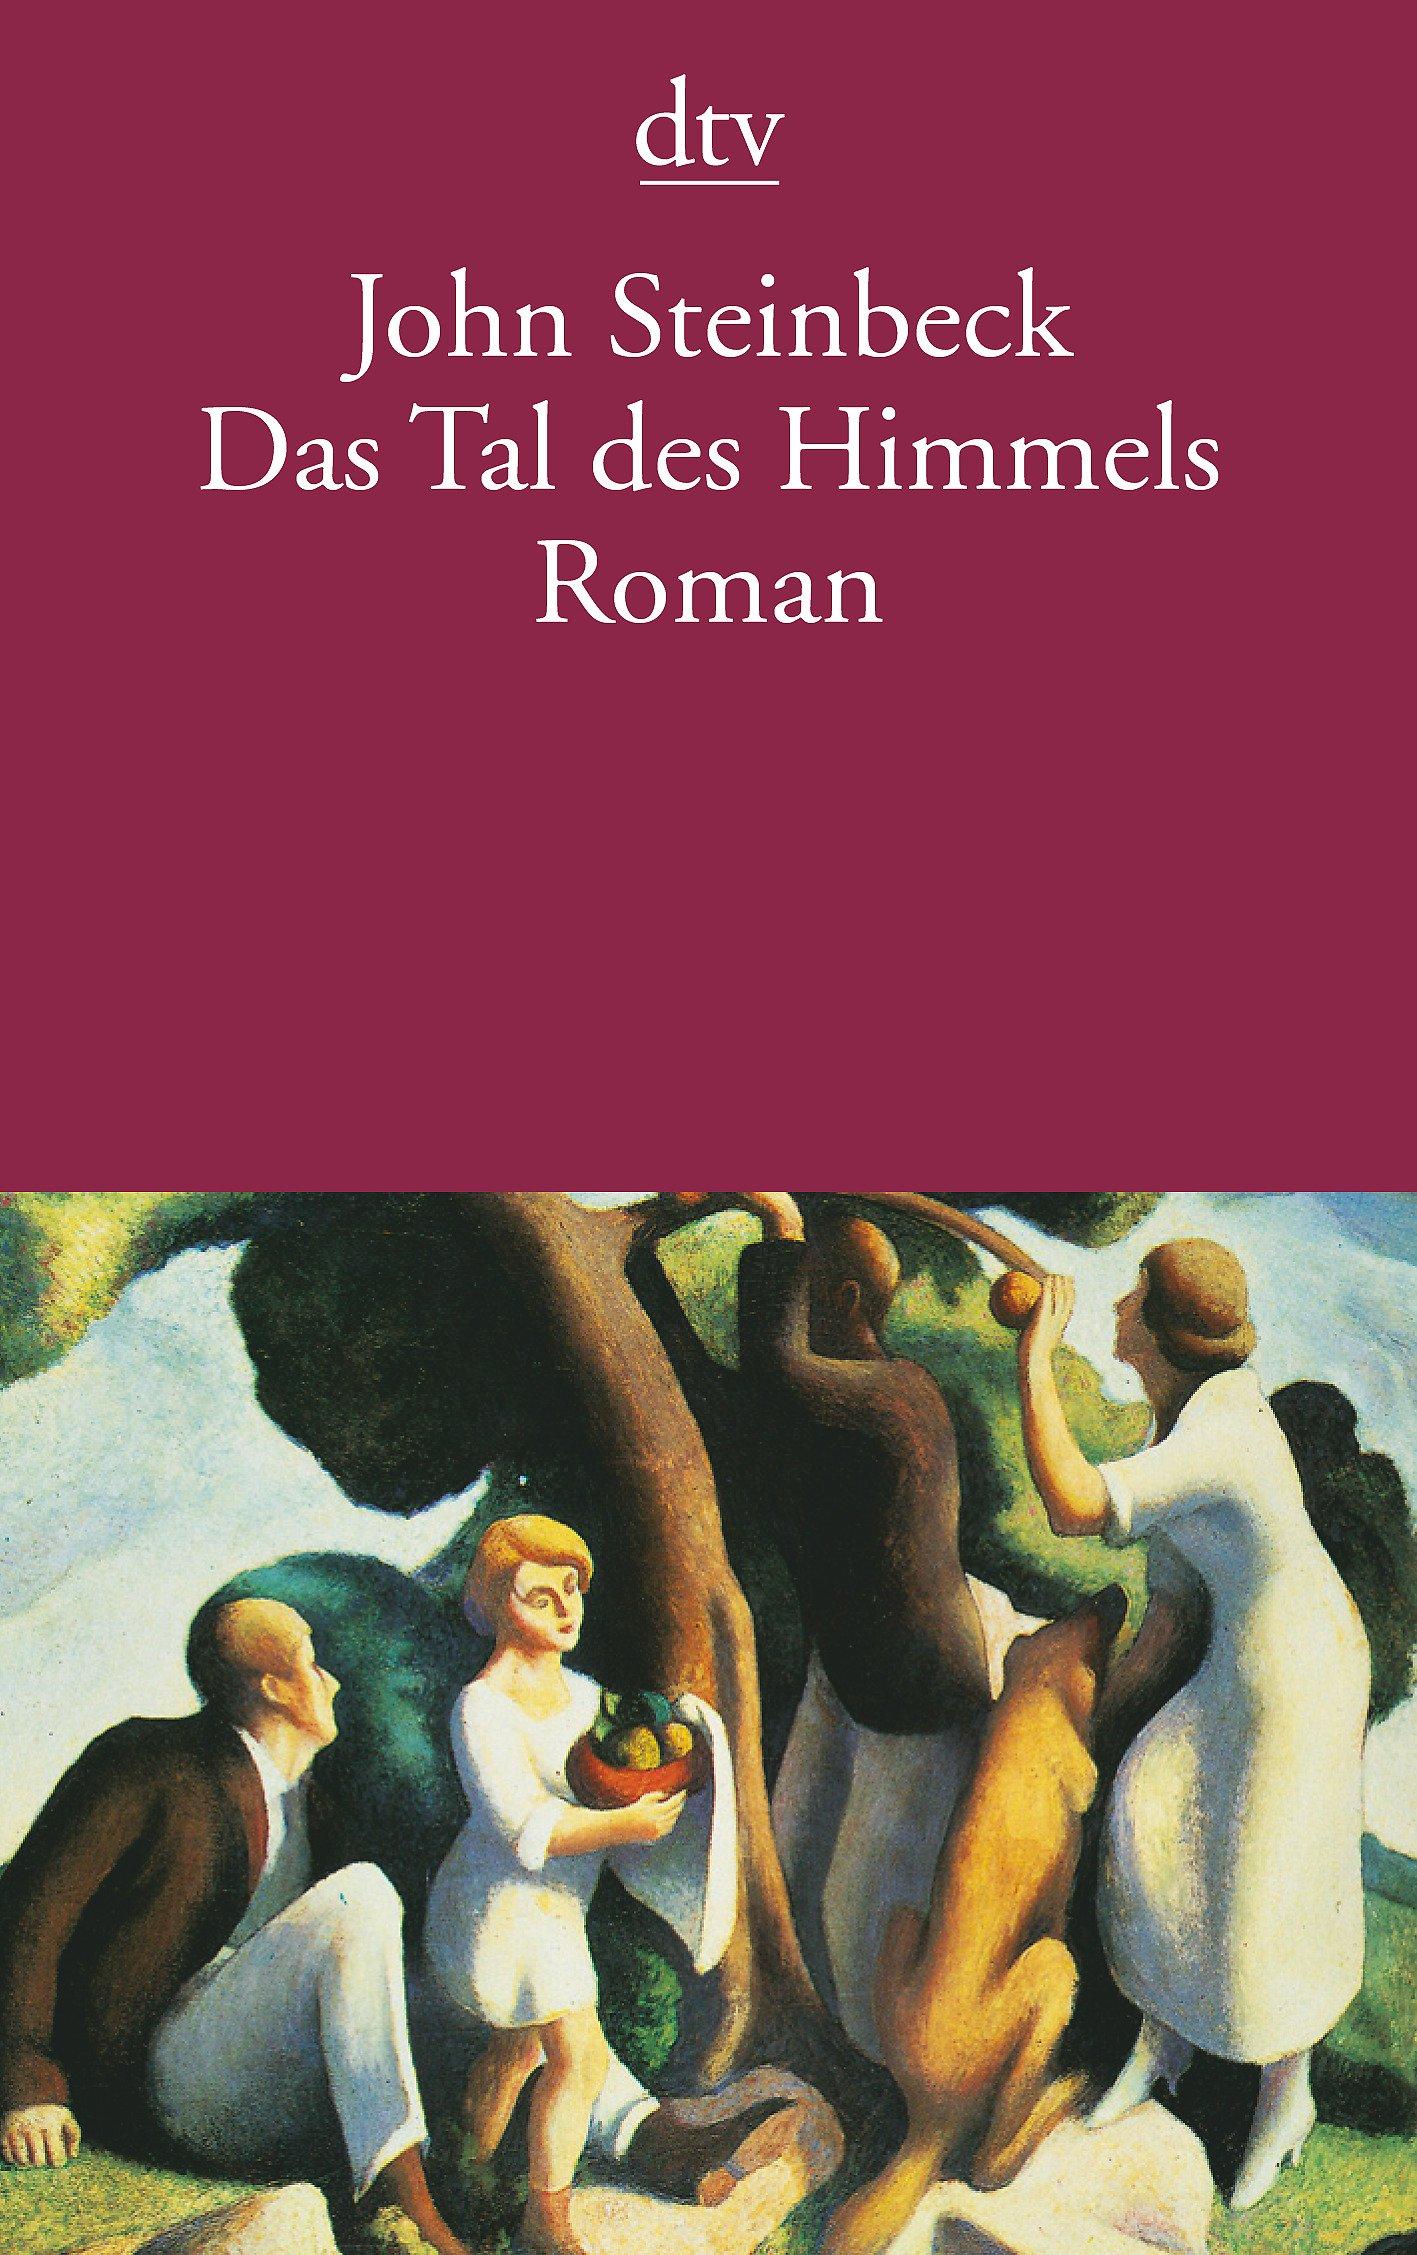 Das Tal des Himmels: Roman